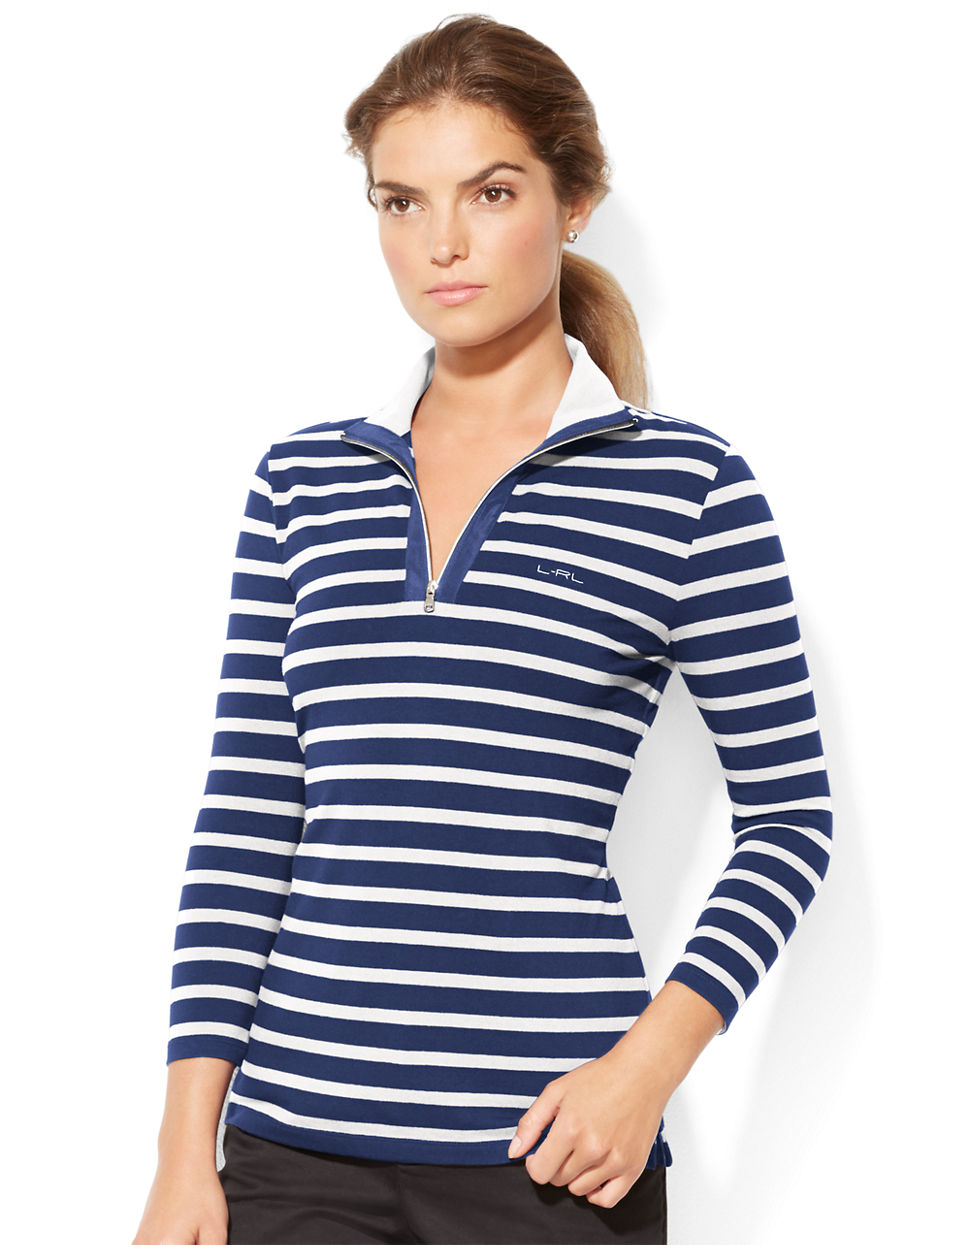 lauren by ralph lauren striped pullover in blue navy white lyst. Black Bedroom Furniture Sets. Home Design Ideas